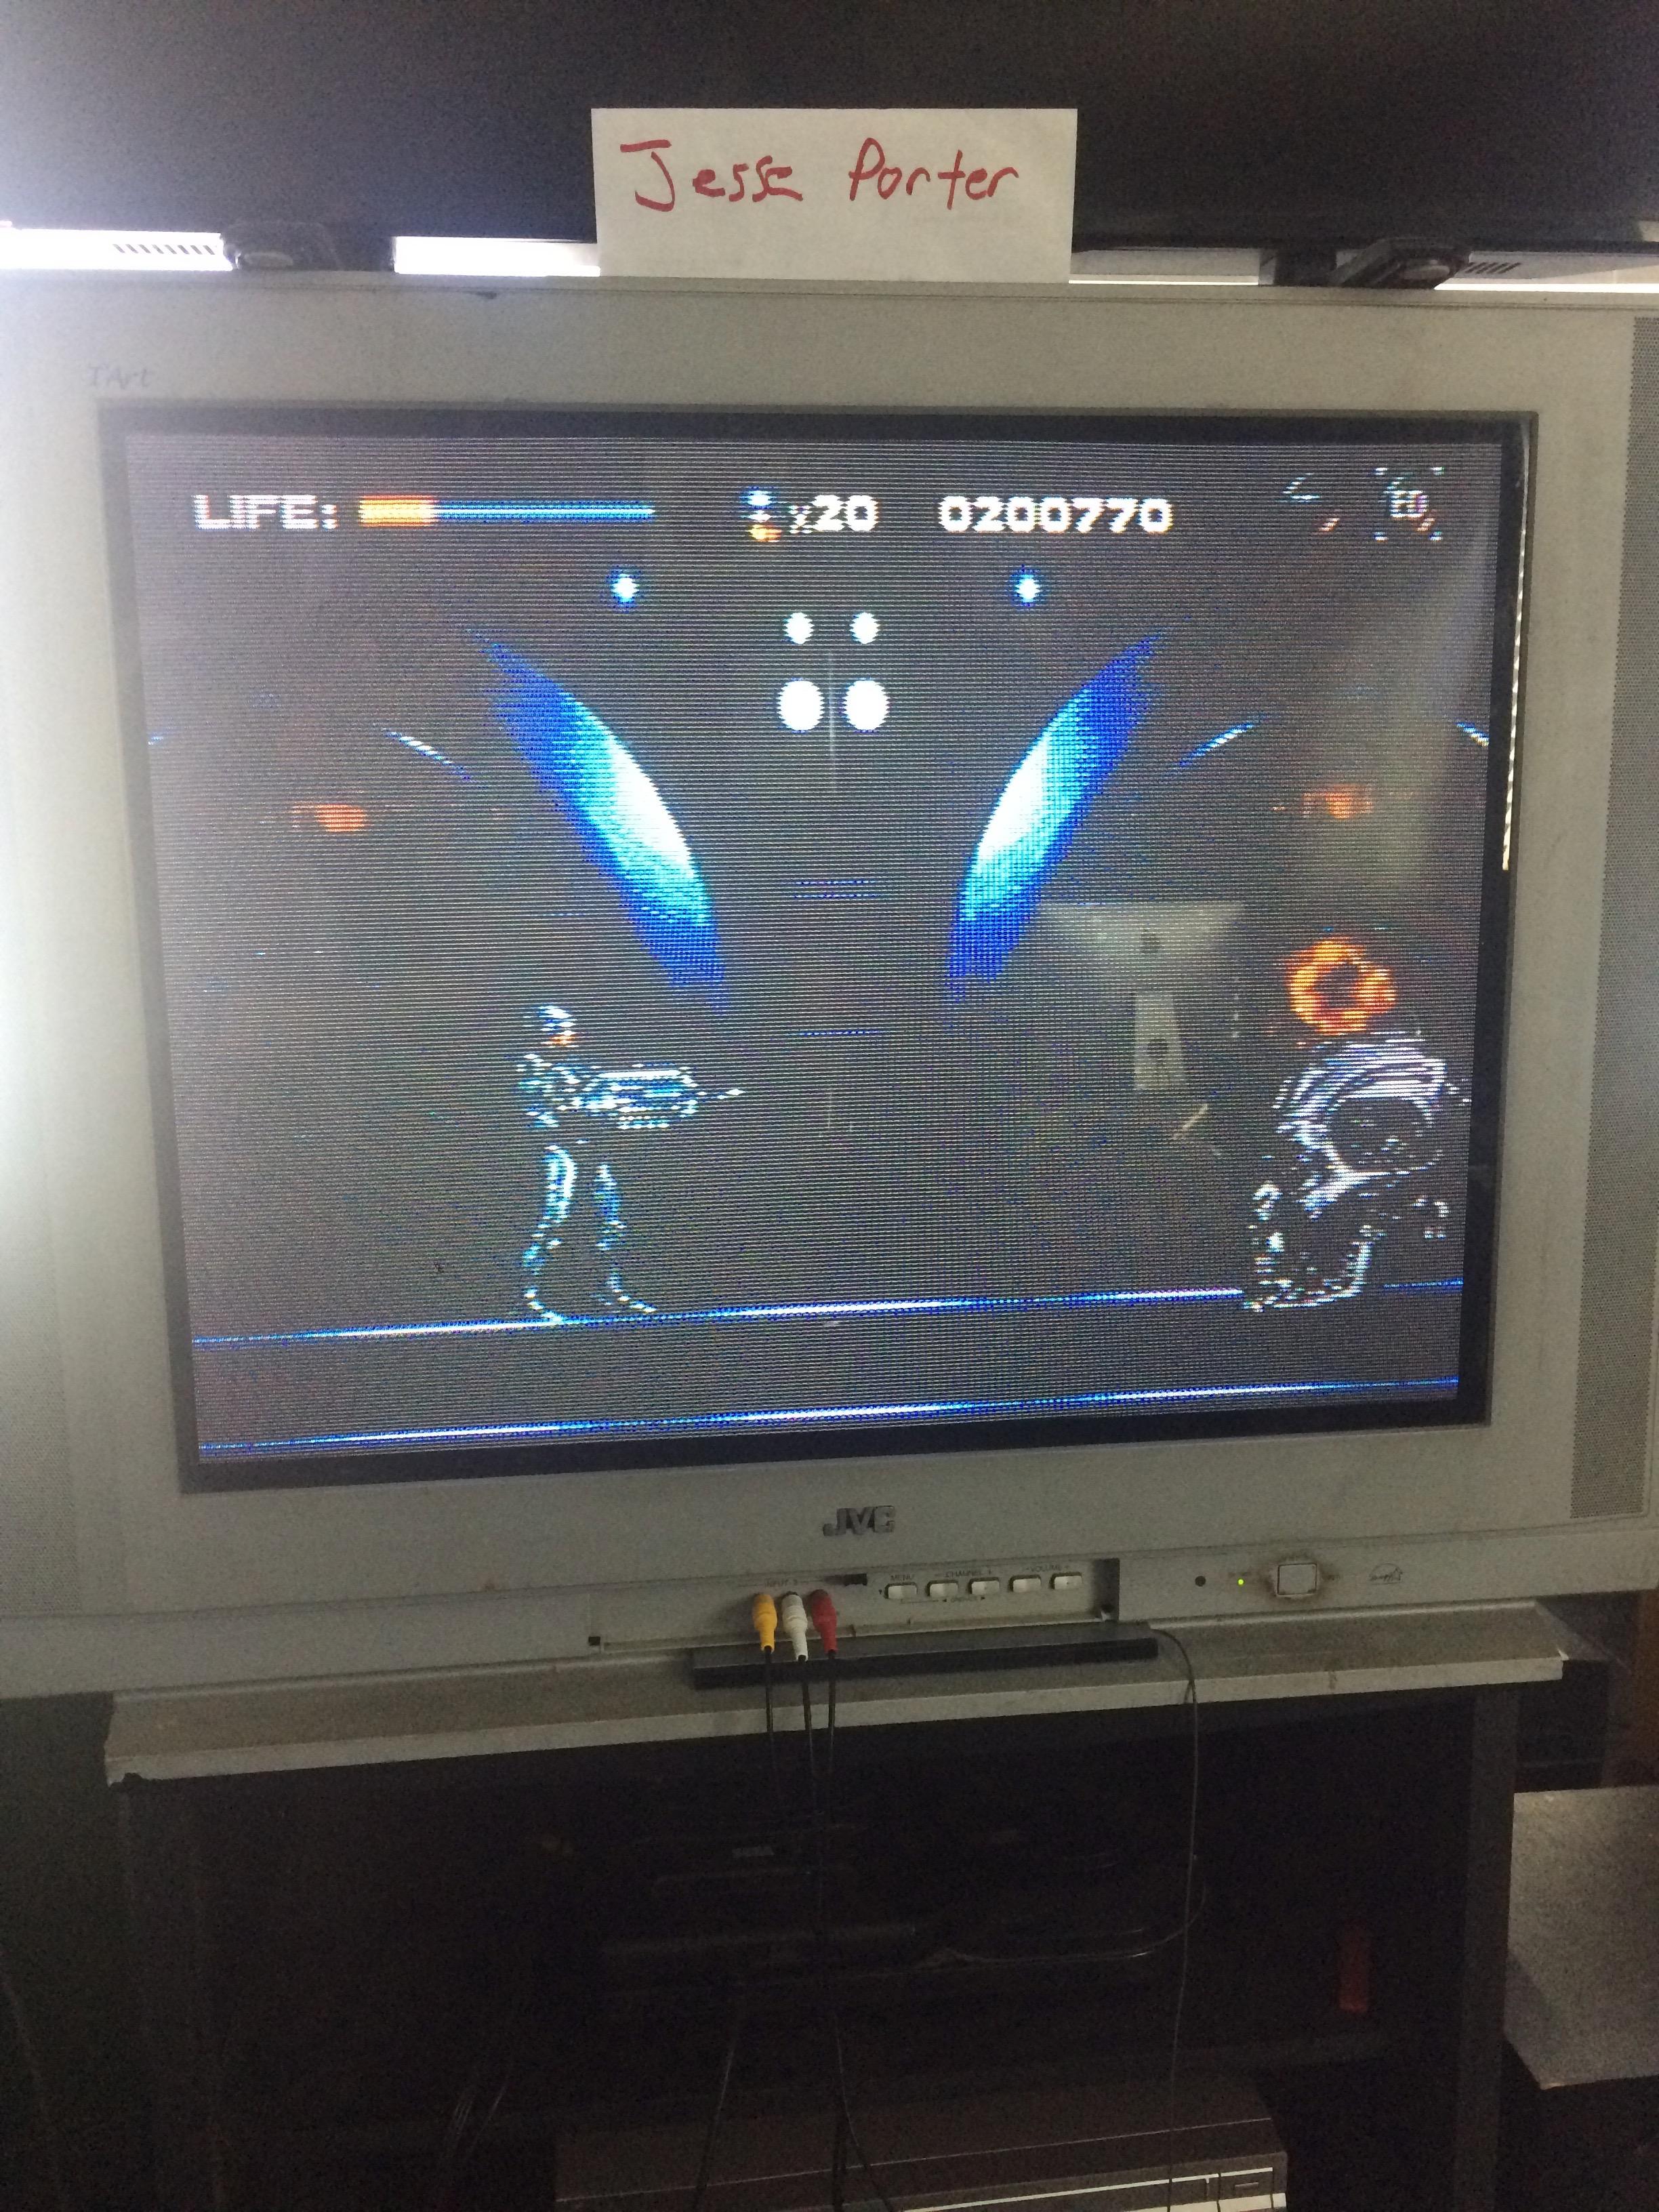 JessePorter: Robocop Versus Terminator (Sega Genesis / MegaDrive) 200,770 points on 2016-10-22 15:57:18